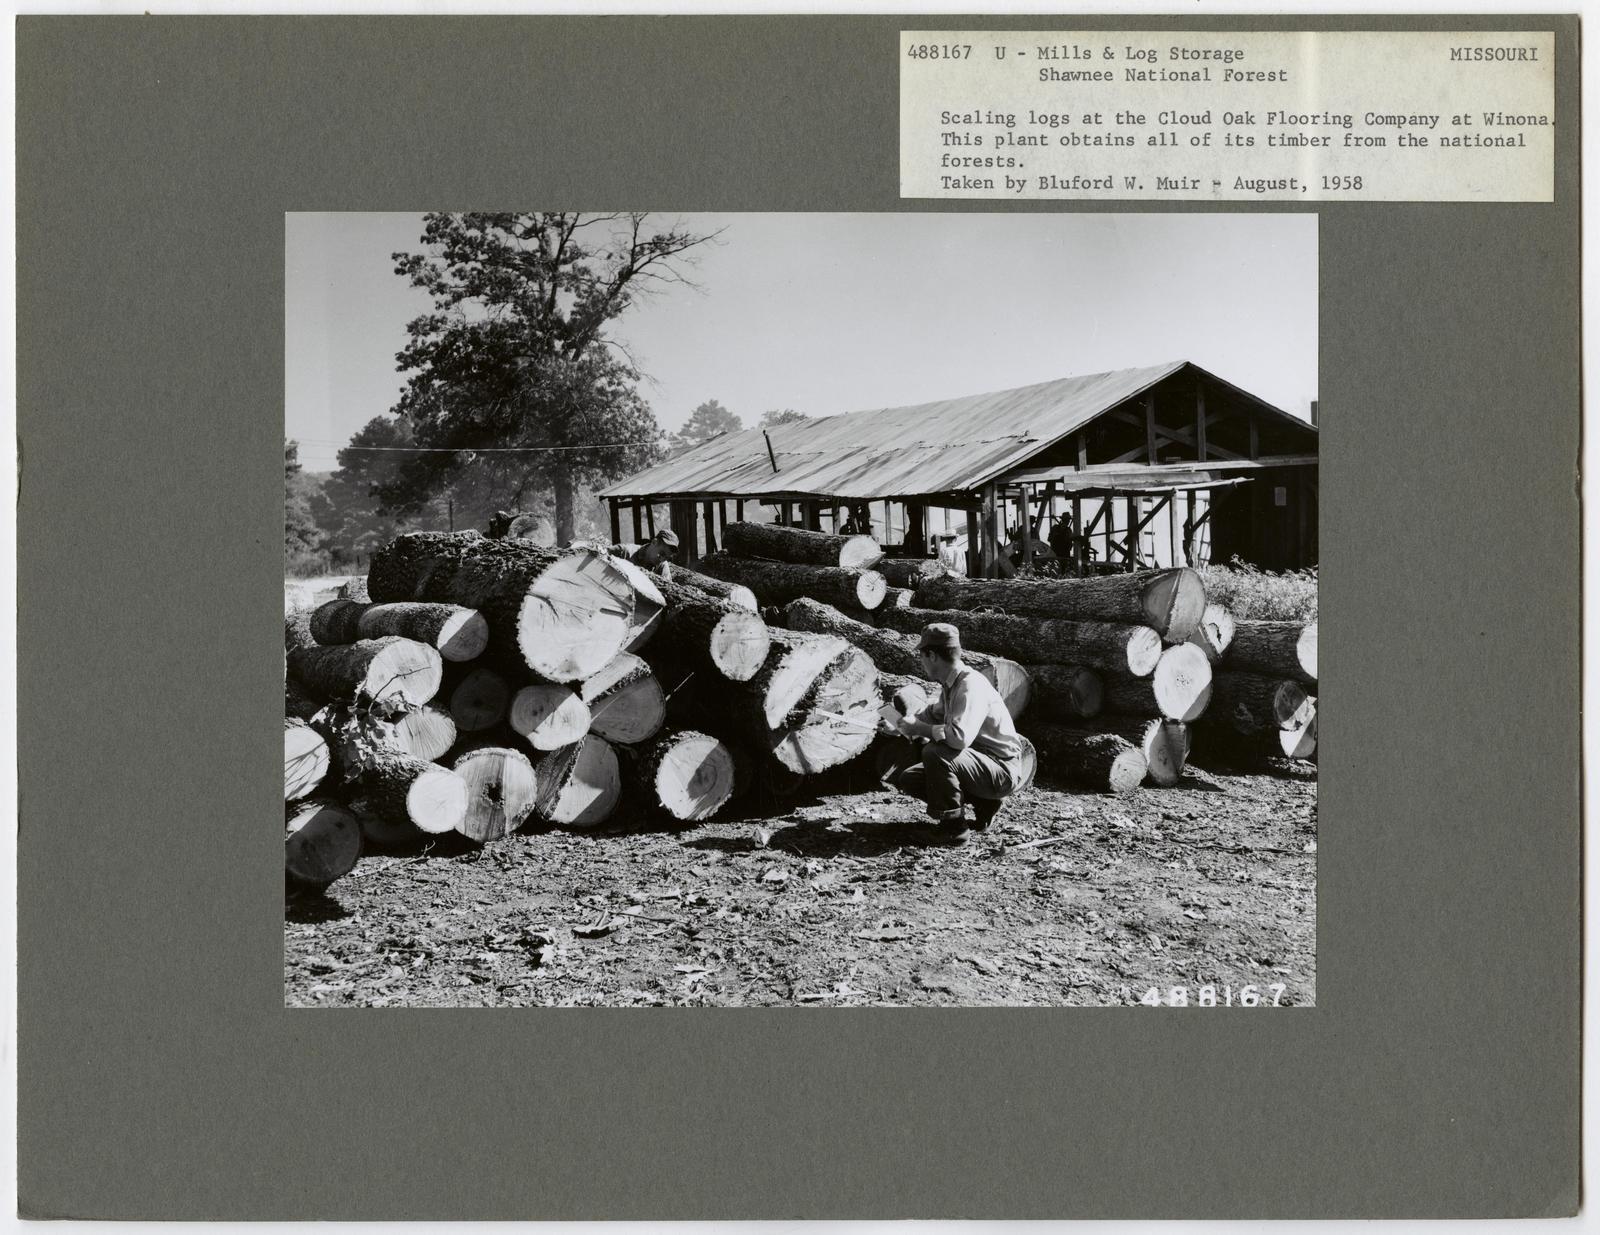 Mills, Milling and Log Storage - Missouri